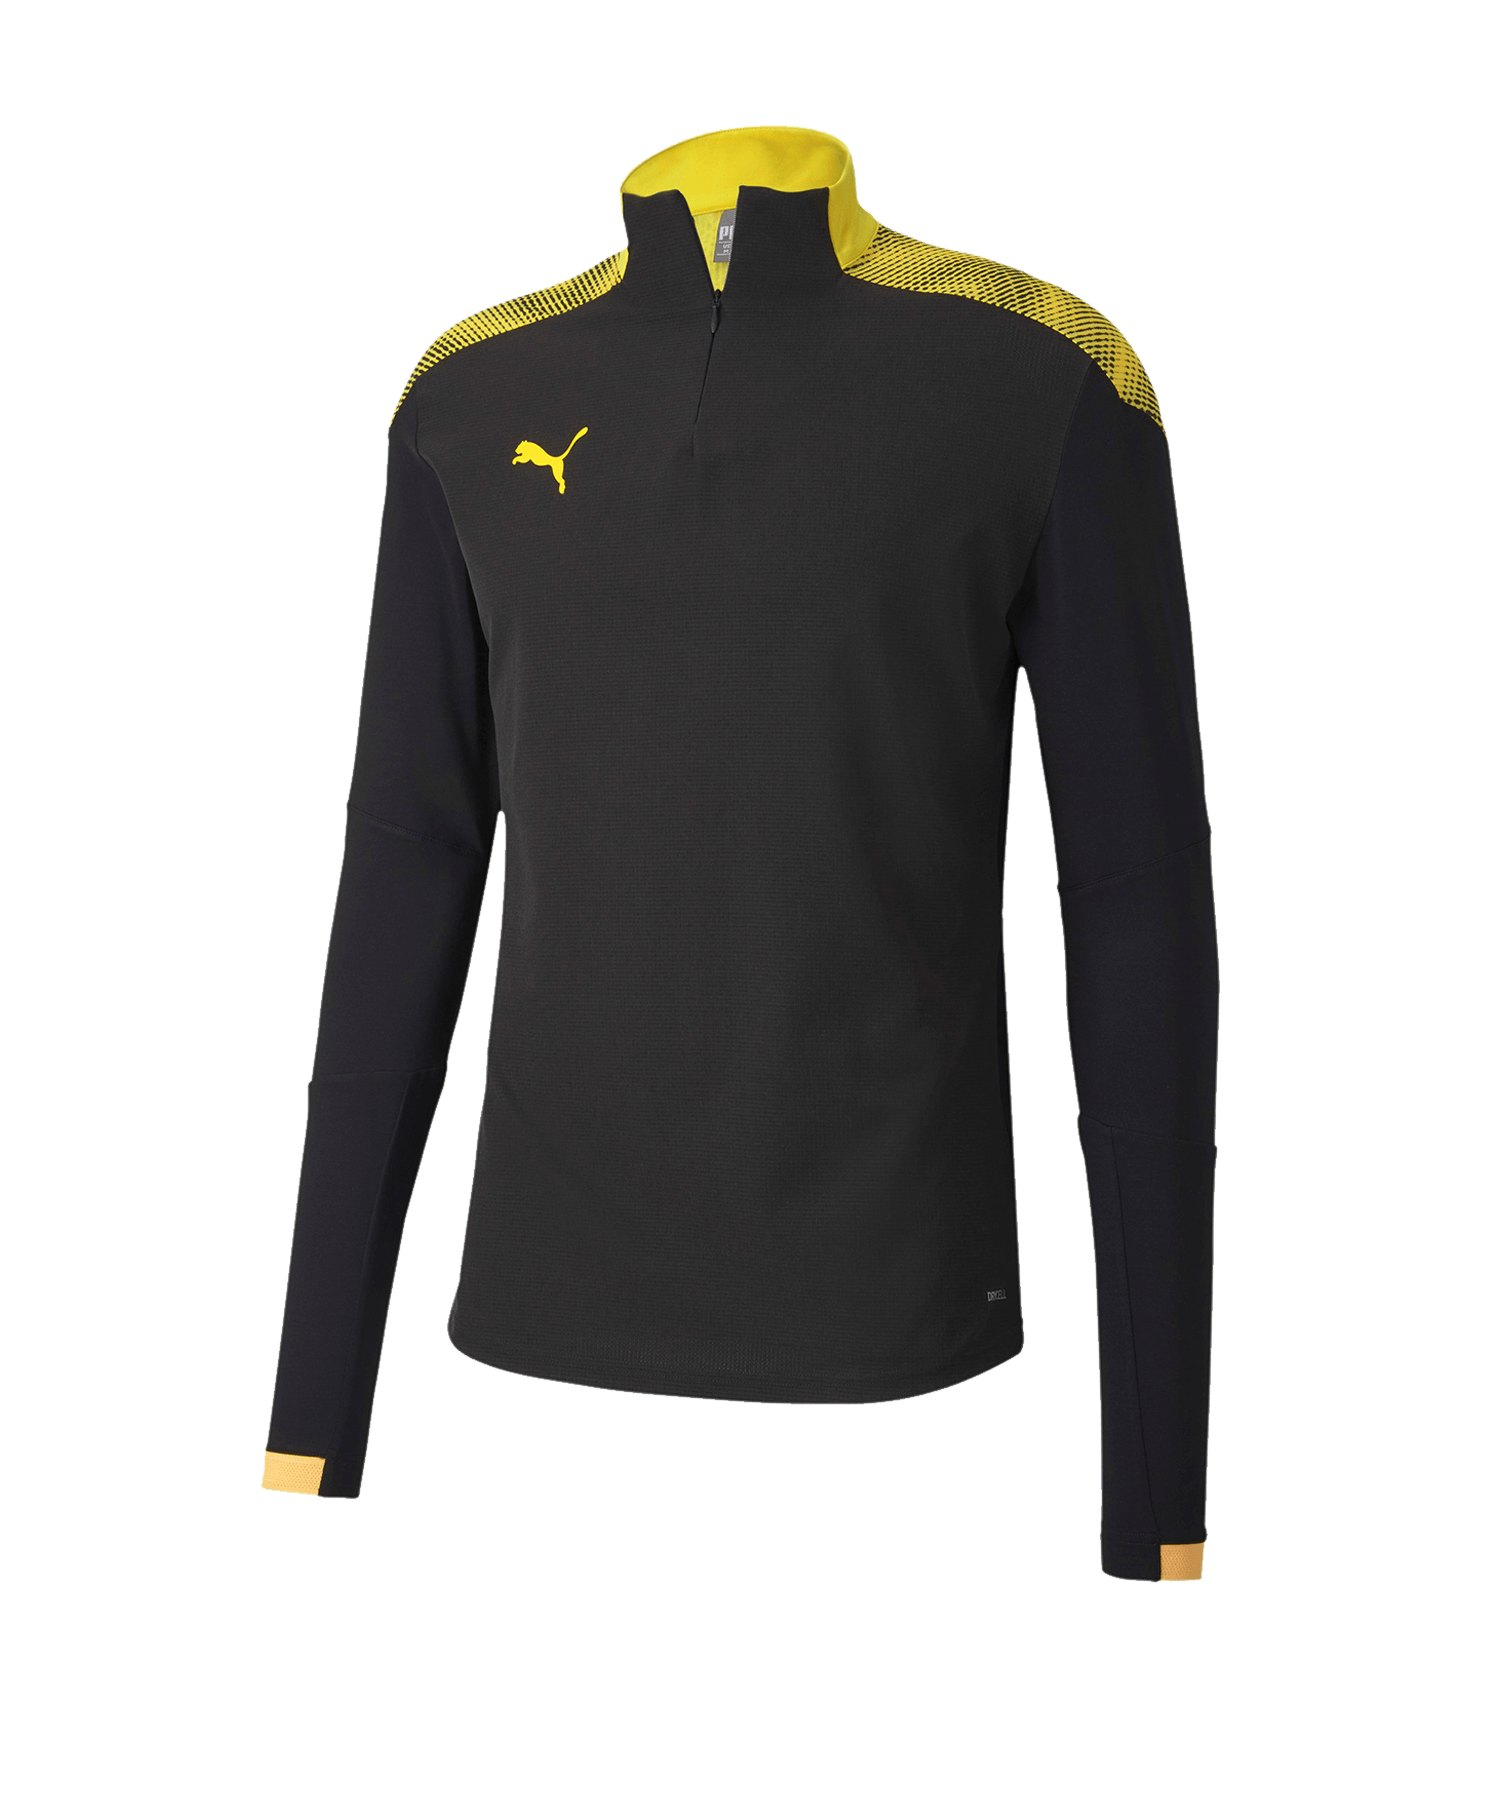 PUMA ftblNXT 1/4 Zip Top Sweatshirt Schwarz F04 - schwarz